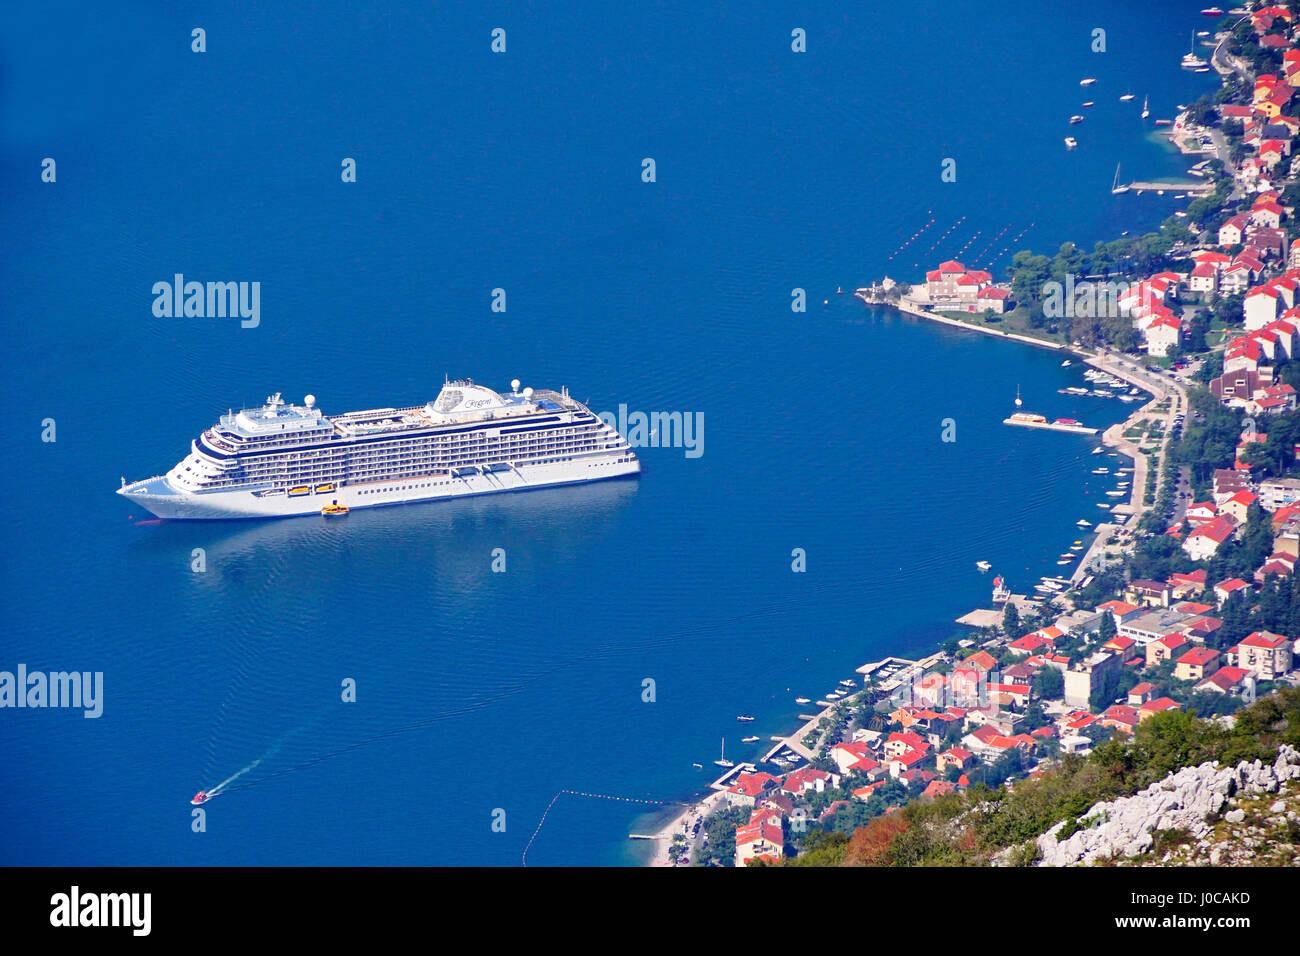 Regent's Seven Seas Explorer luxury cruise ship in harbor of Bay of Kotor, Montenegro. Stock Photo